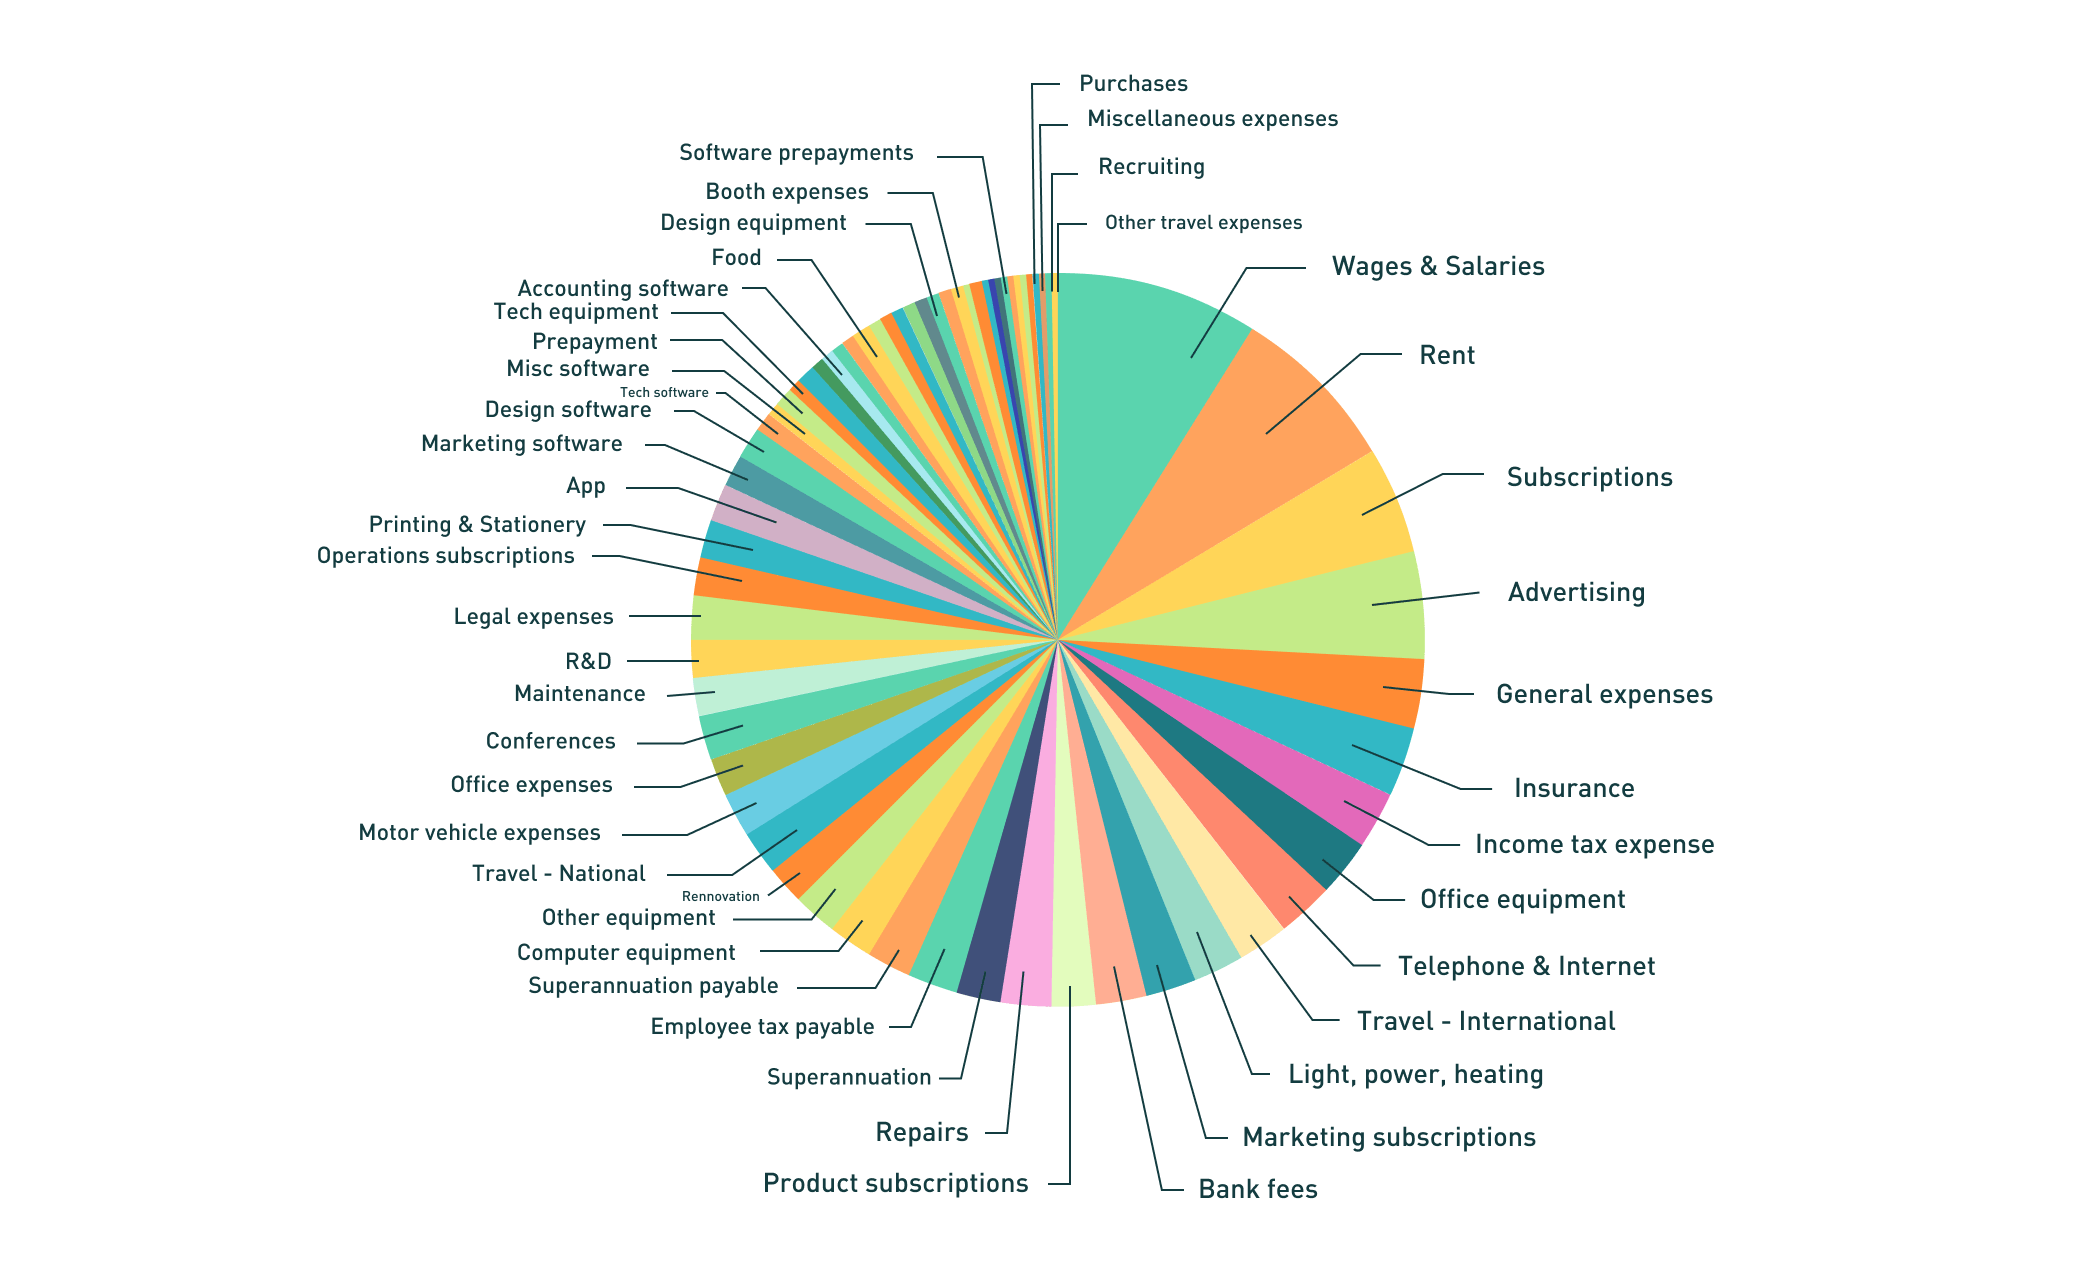 giniPredict messy chart